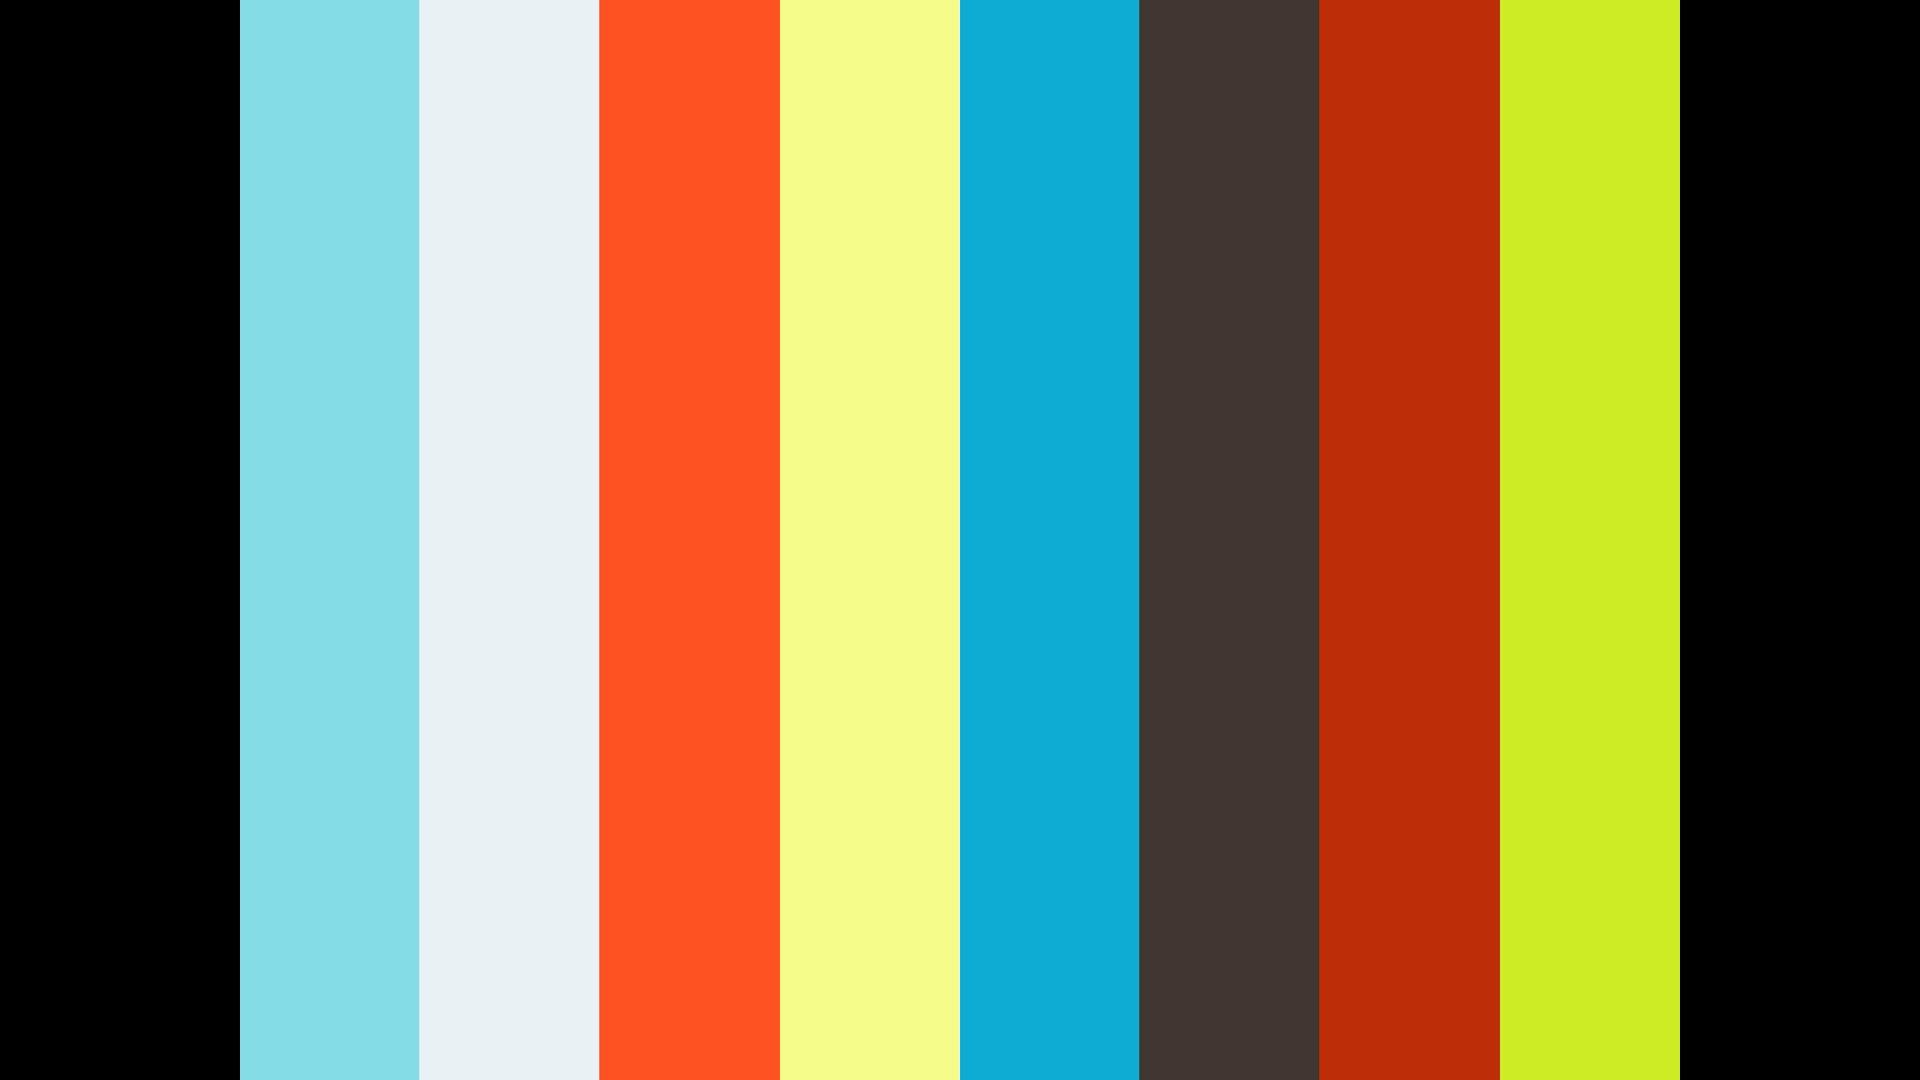 Slider. Light theme. 1080x1080